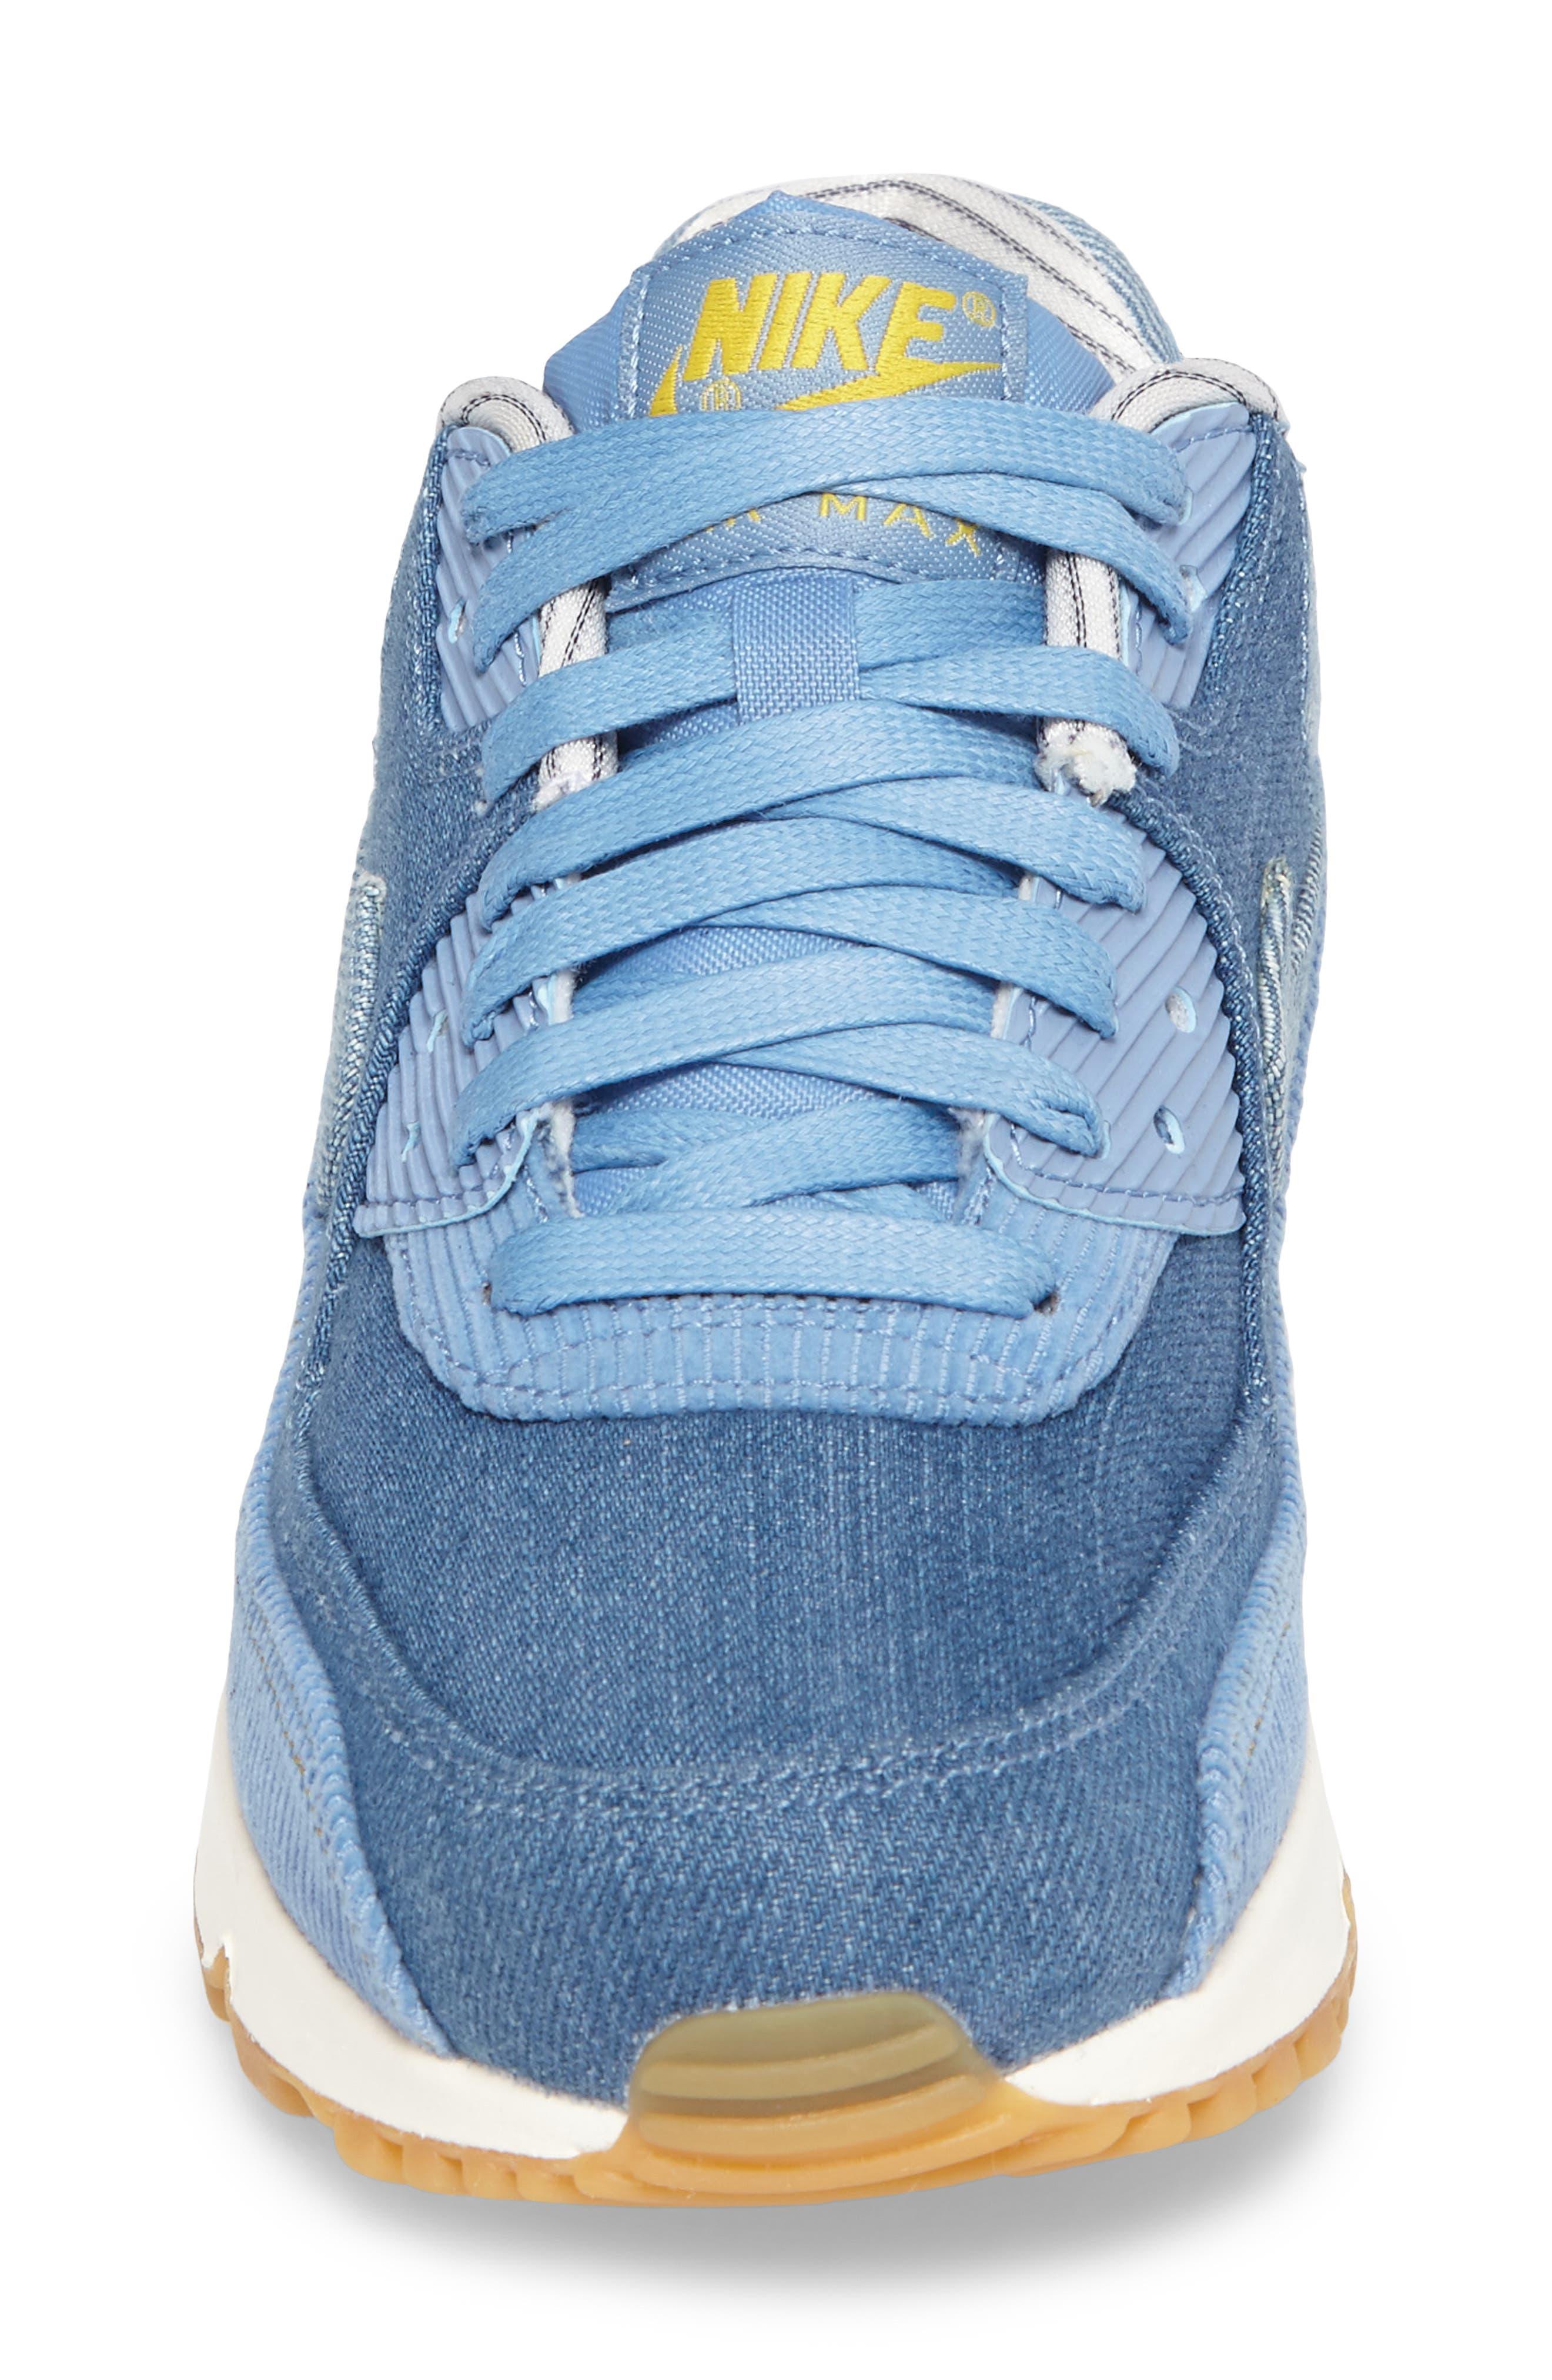 Air Max 90 SE Sneaker,                             Alternate thumbnail 35, color,